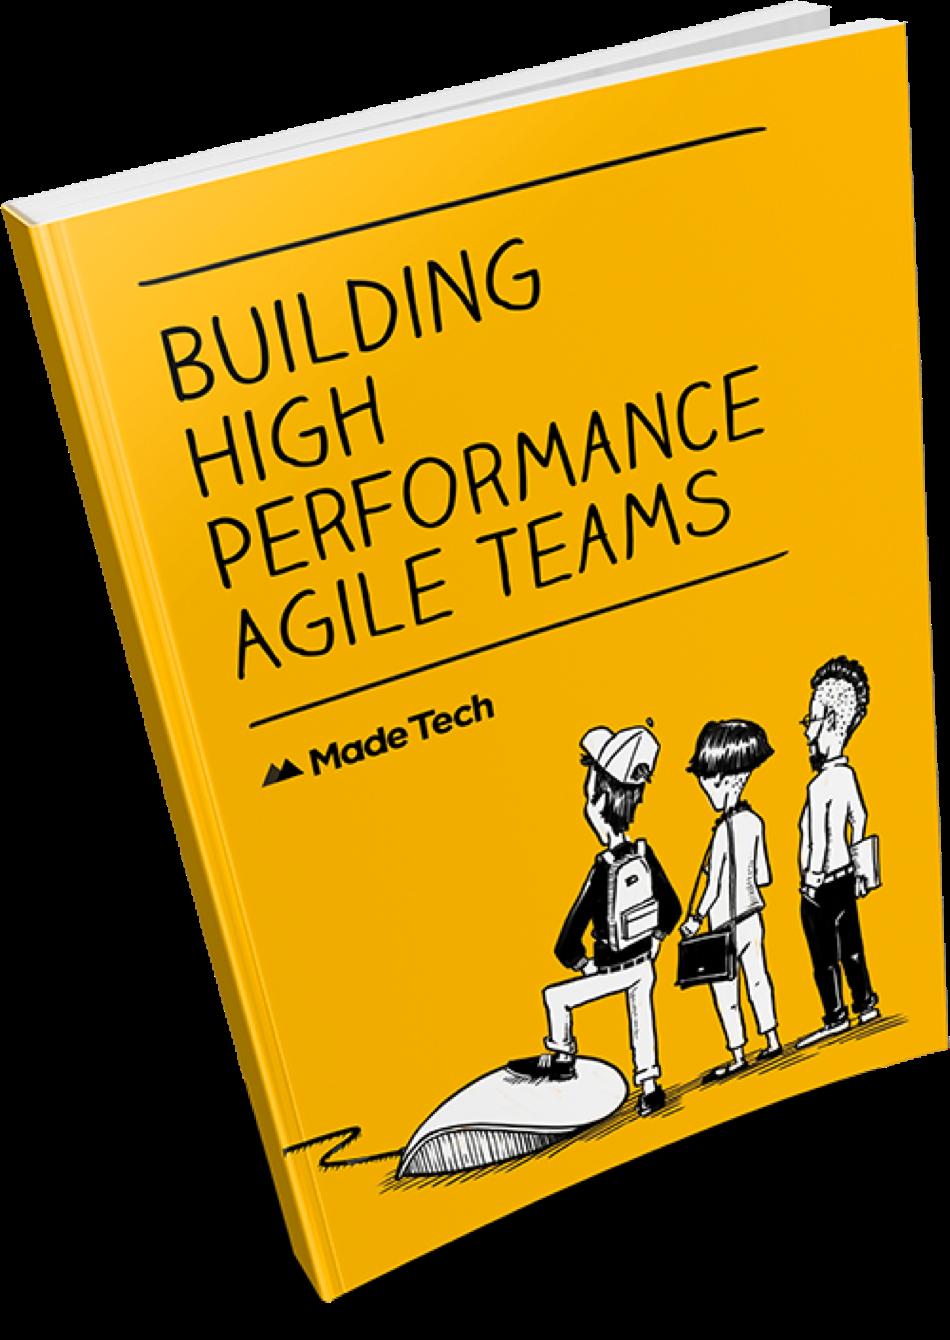 Building High Performance Agile Teams book cover